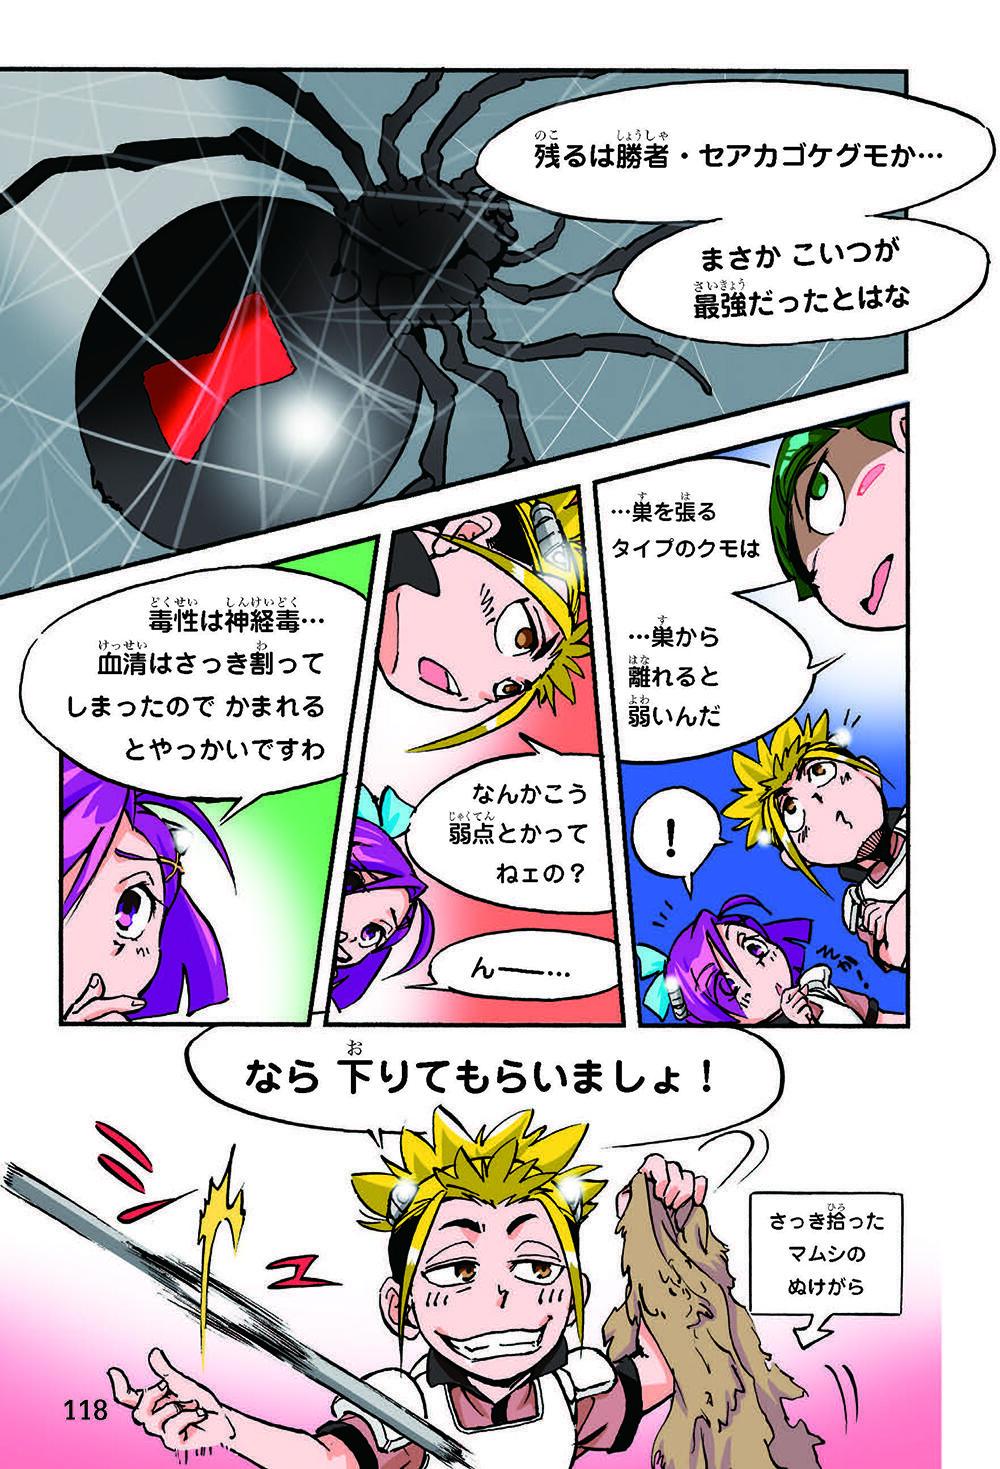 BB_蜊ア髯コ逕溽黄_繝倥z繝シ繧キ繧兩118.jpg